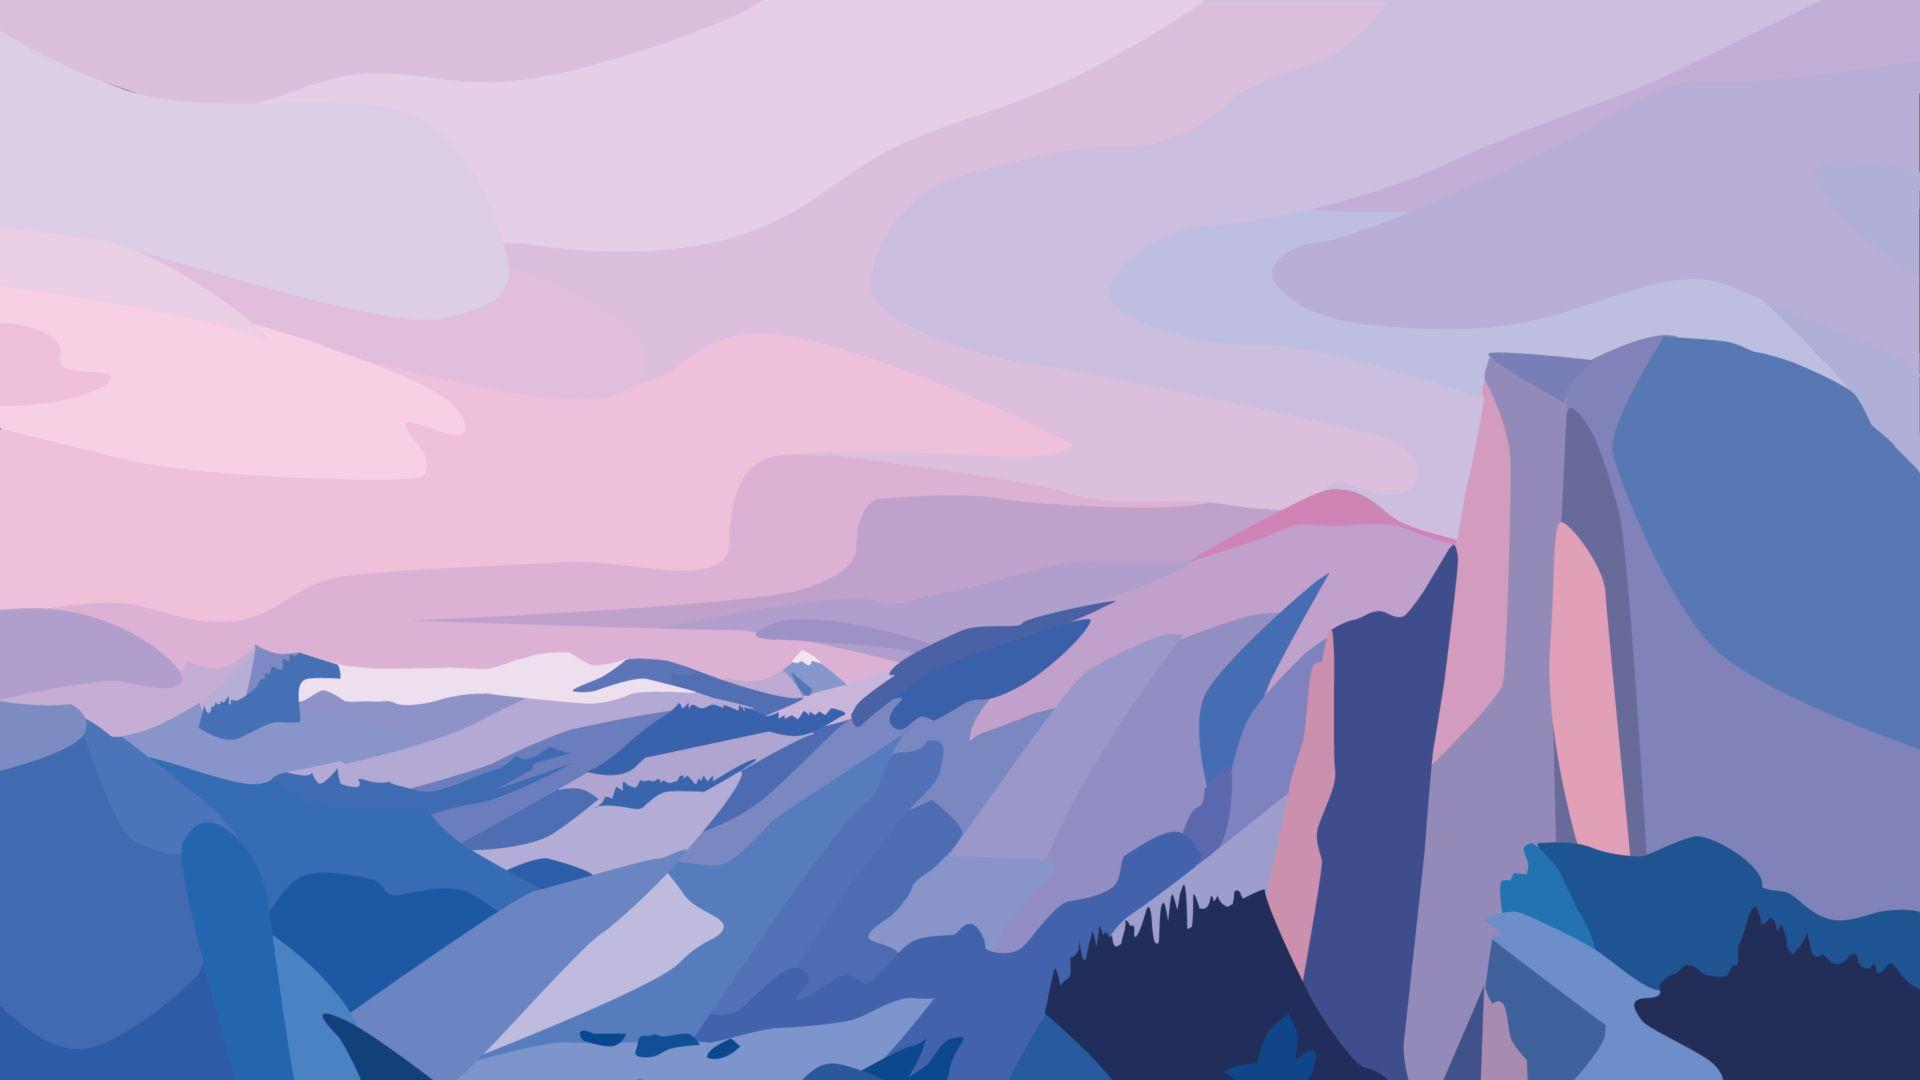 Minimalist Desktop wallpaper picture hd